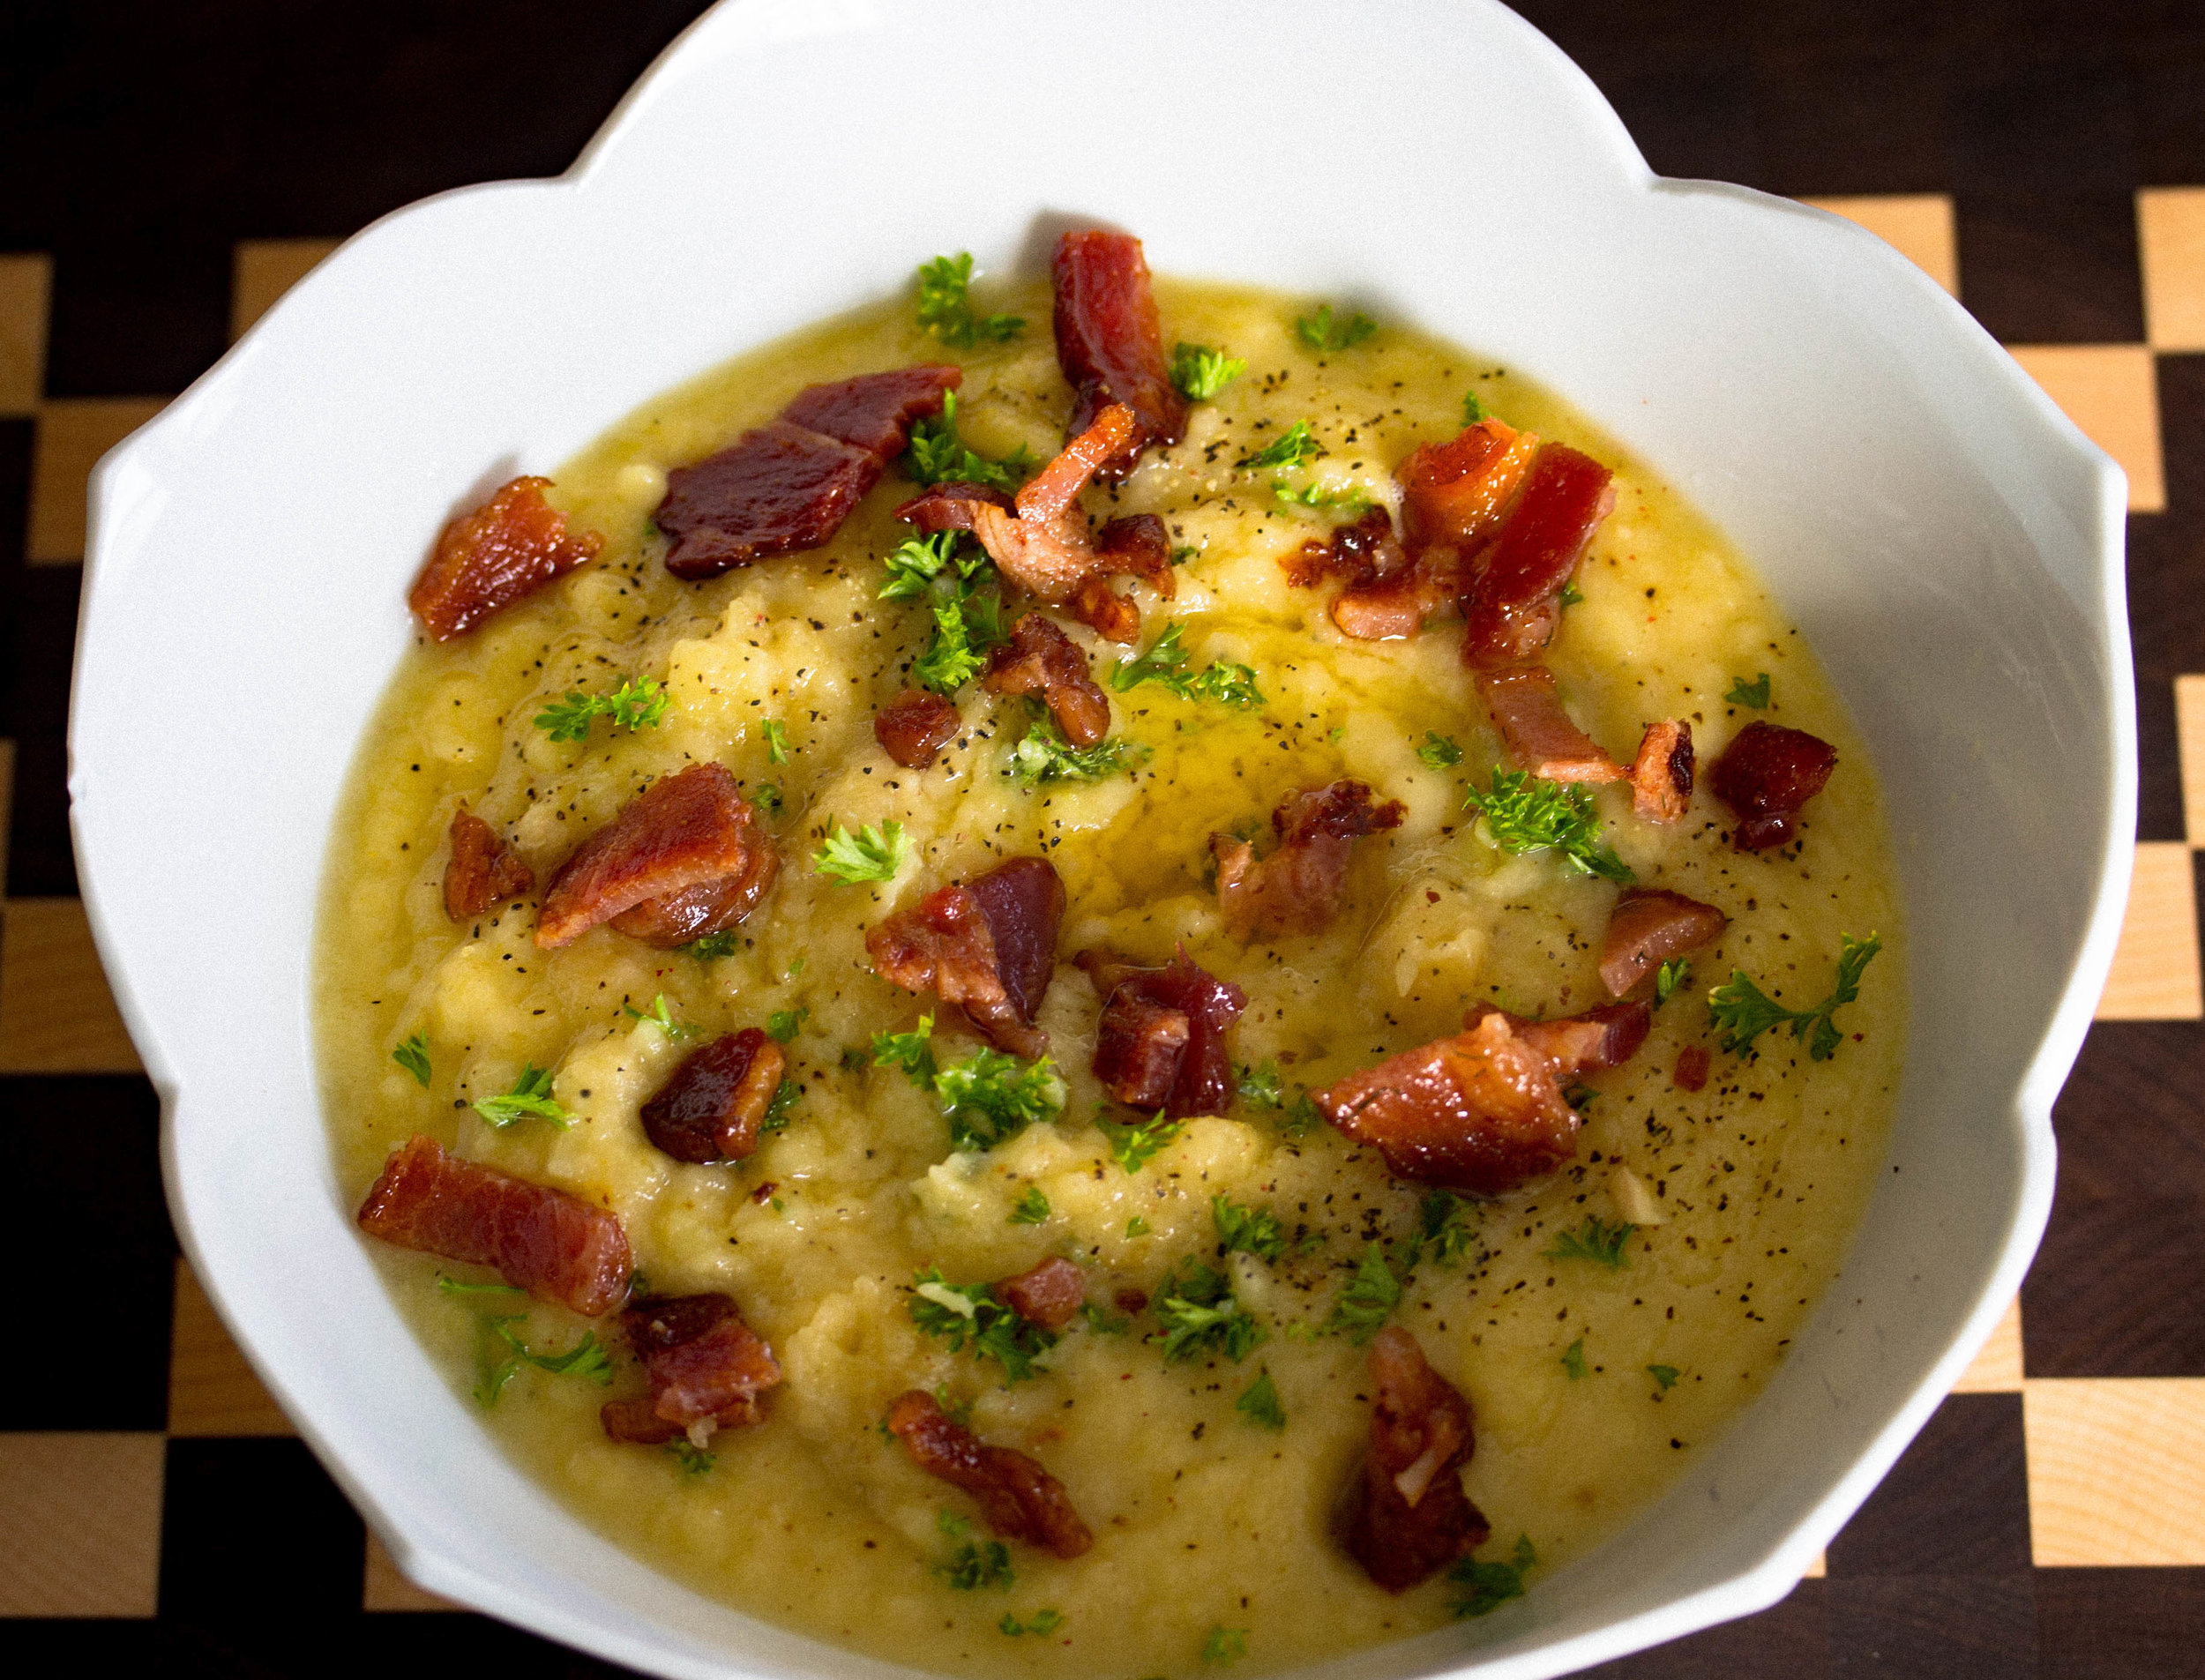 My take on the classic potato leek soup: Rutabaga Leek Soup topped with Bacon